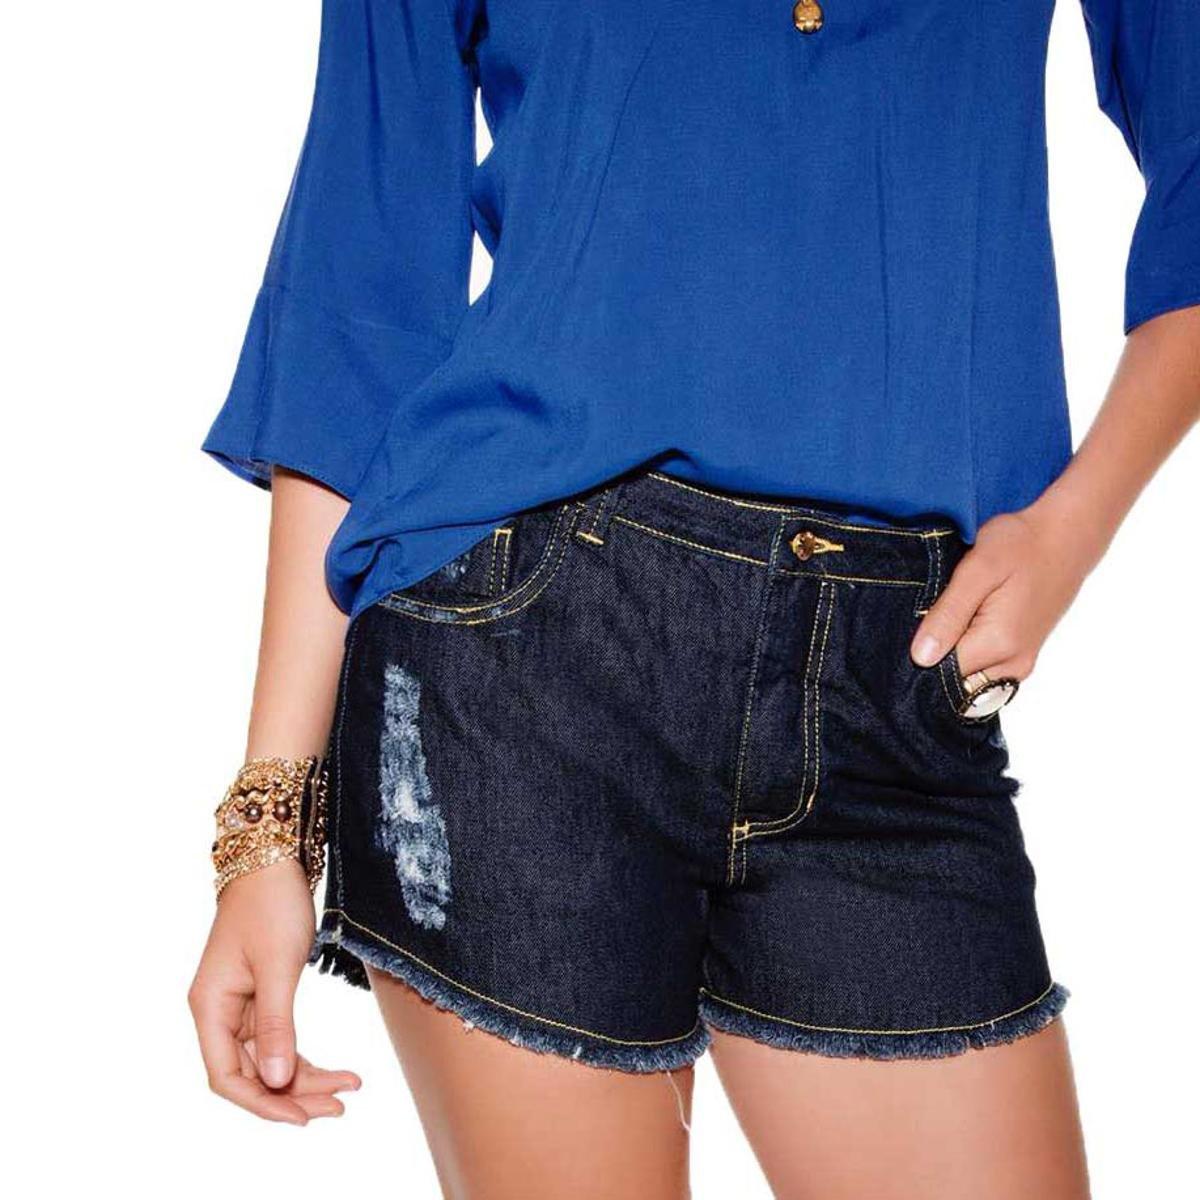 3086be366 Shorts jeans escuro barra desfiada azul compre agora netshoes jpg 544x544  Short jeans barra desfiada